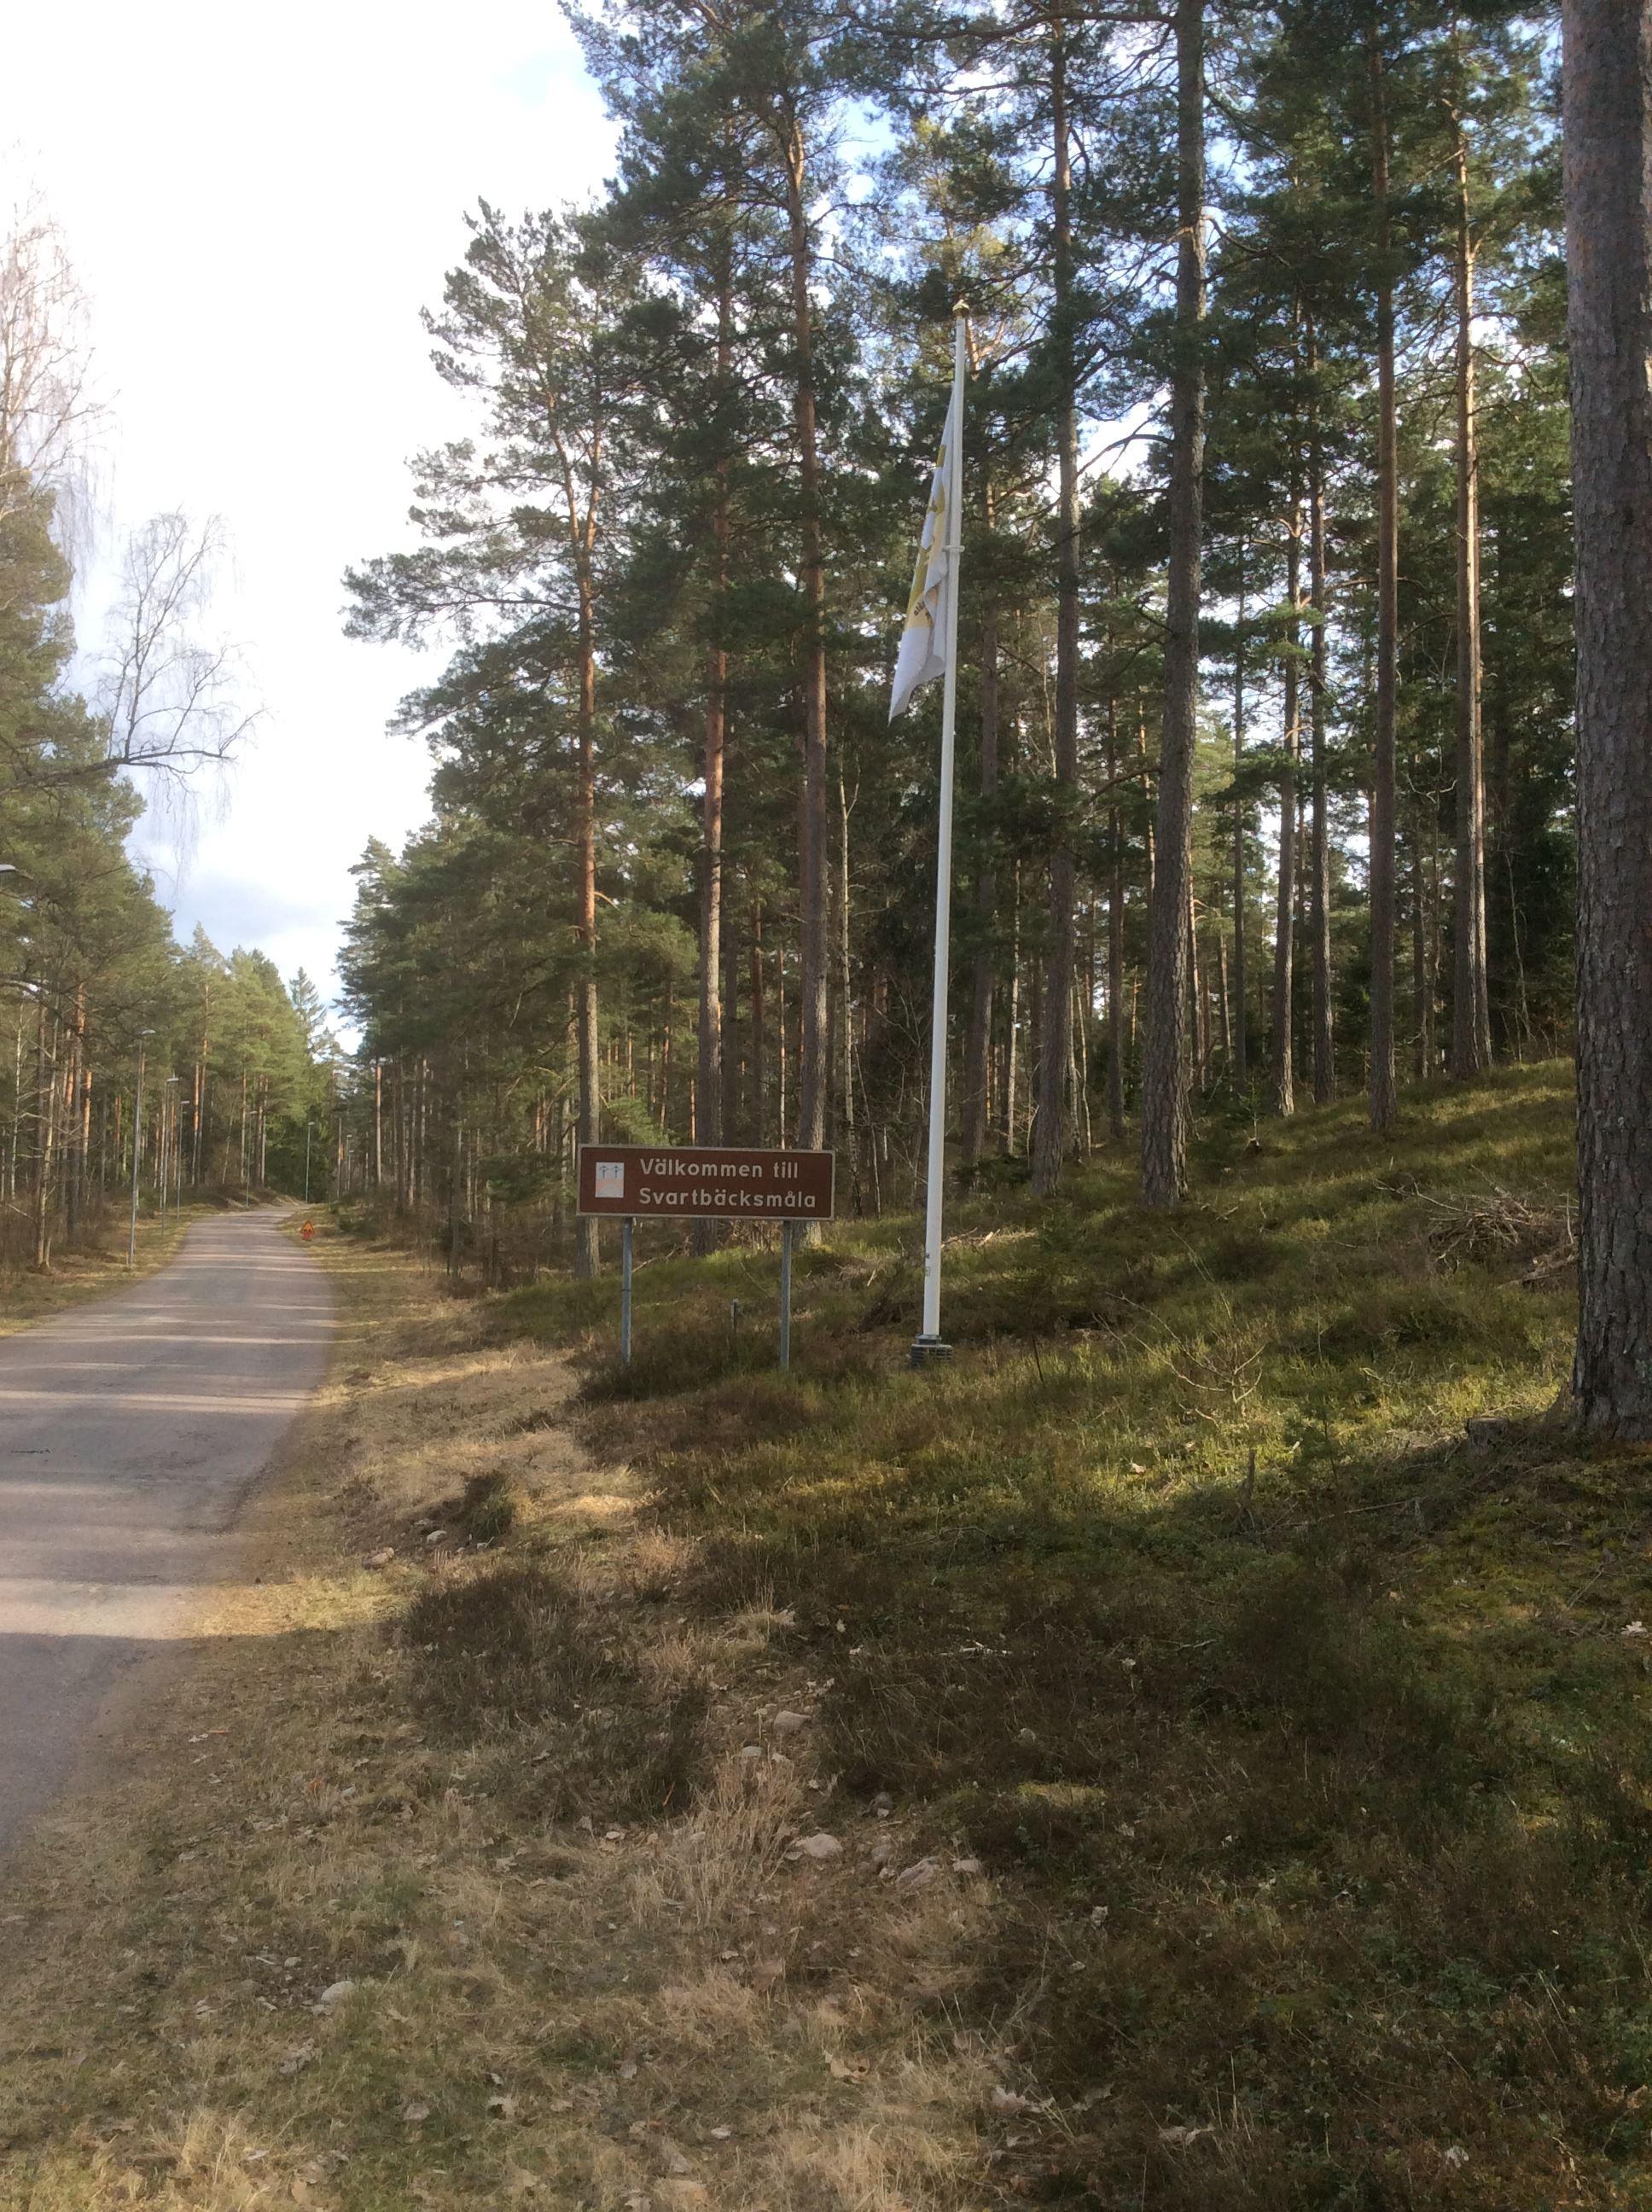 Natur- & Kulturguider i Glasriket - Skogsvandring